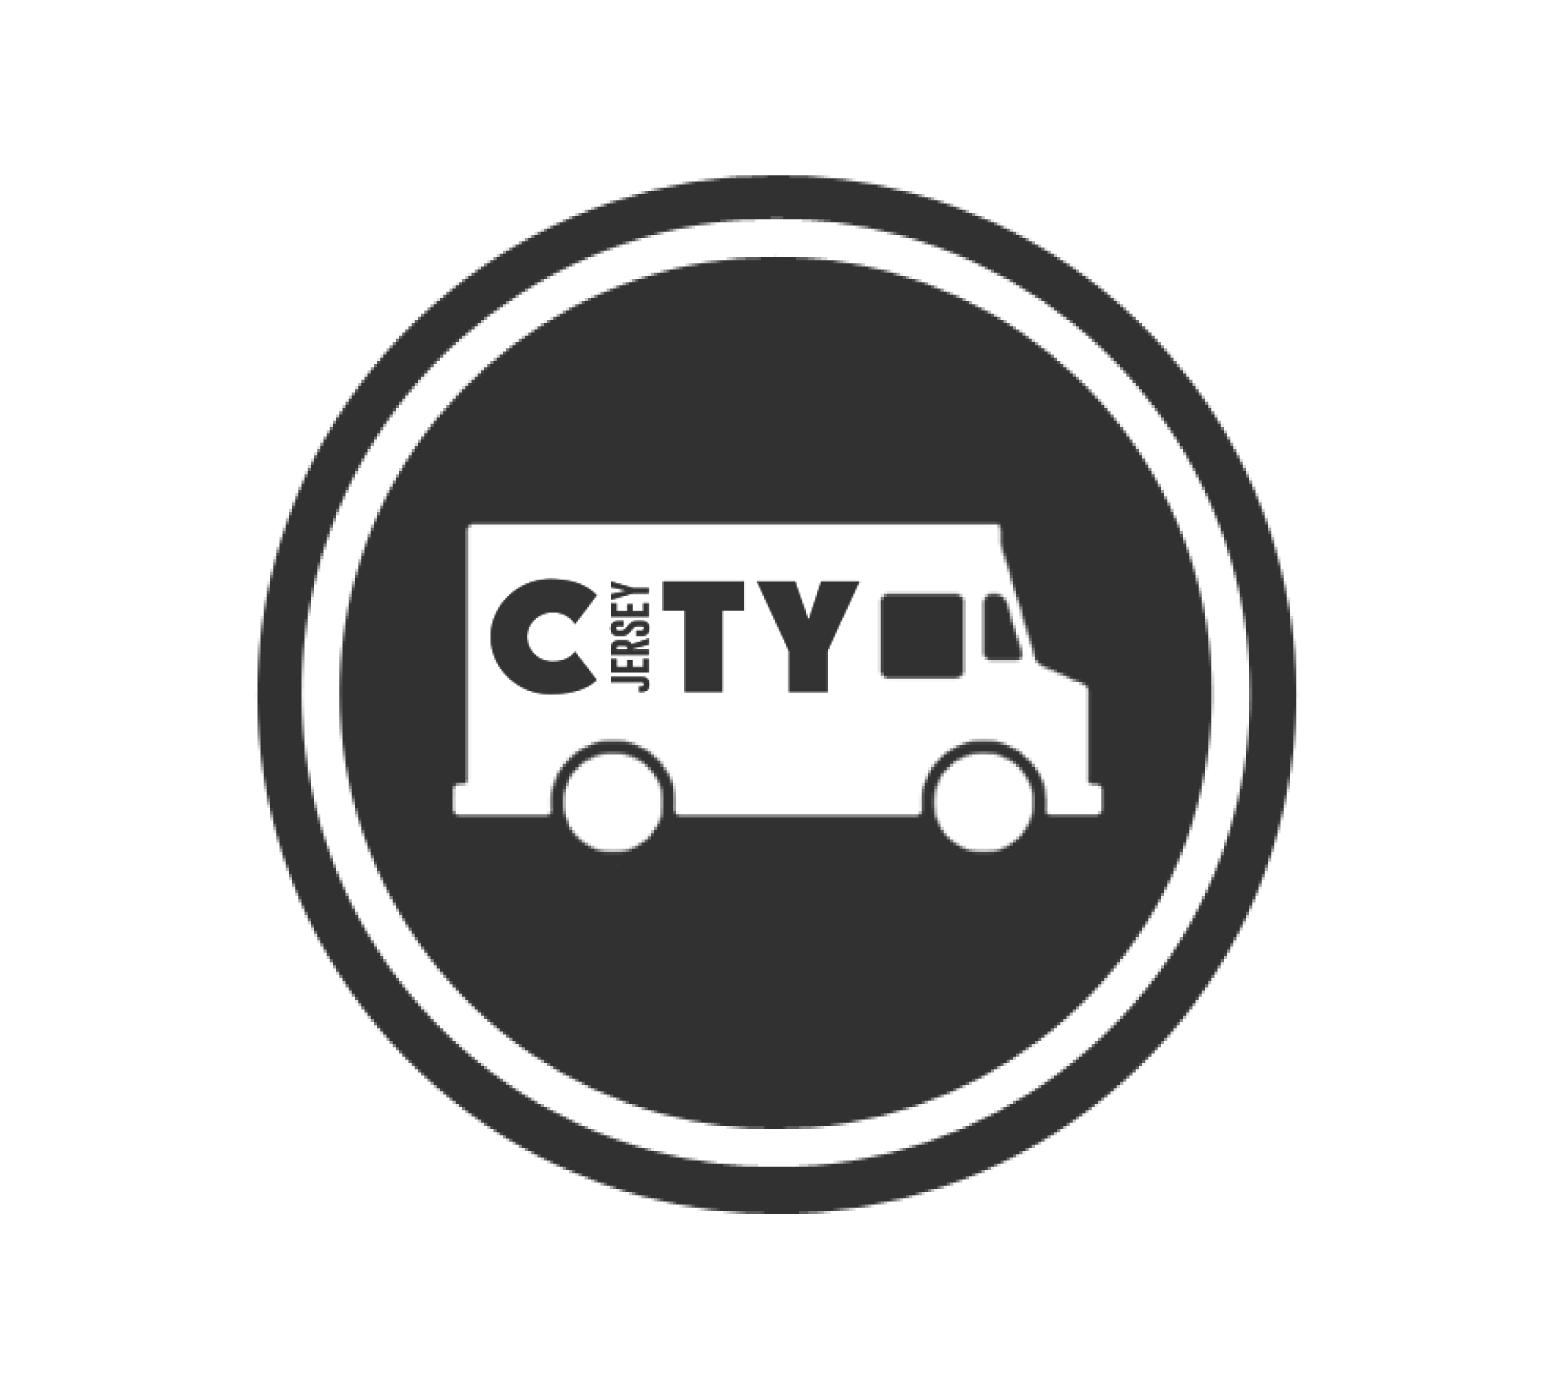 Jersey City Food Trucks